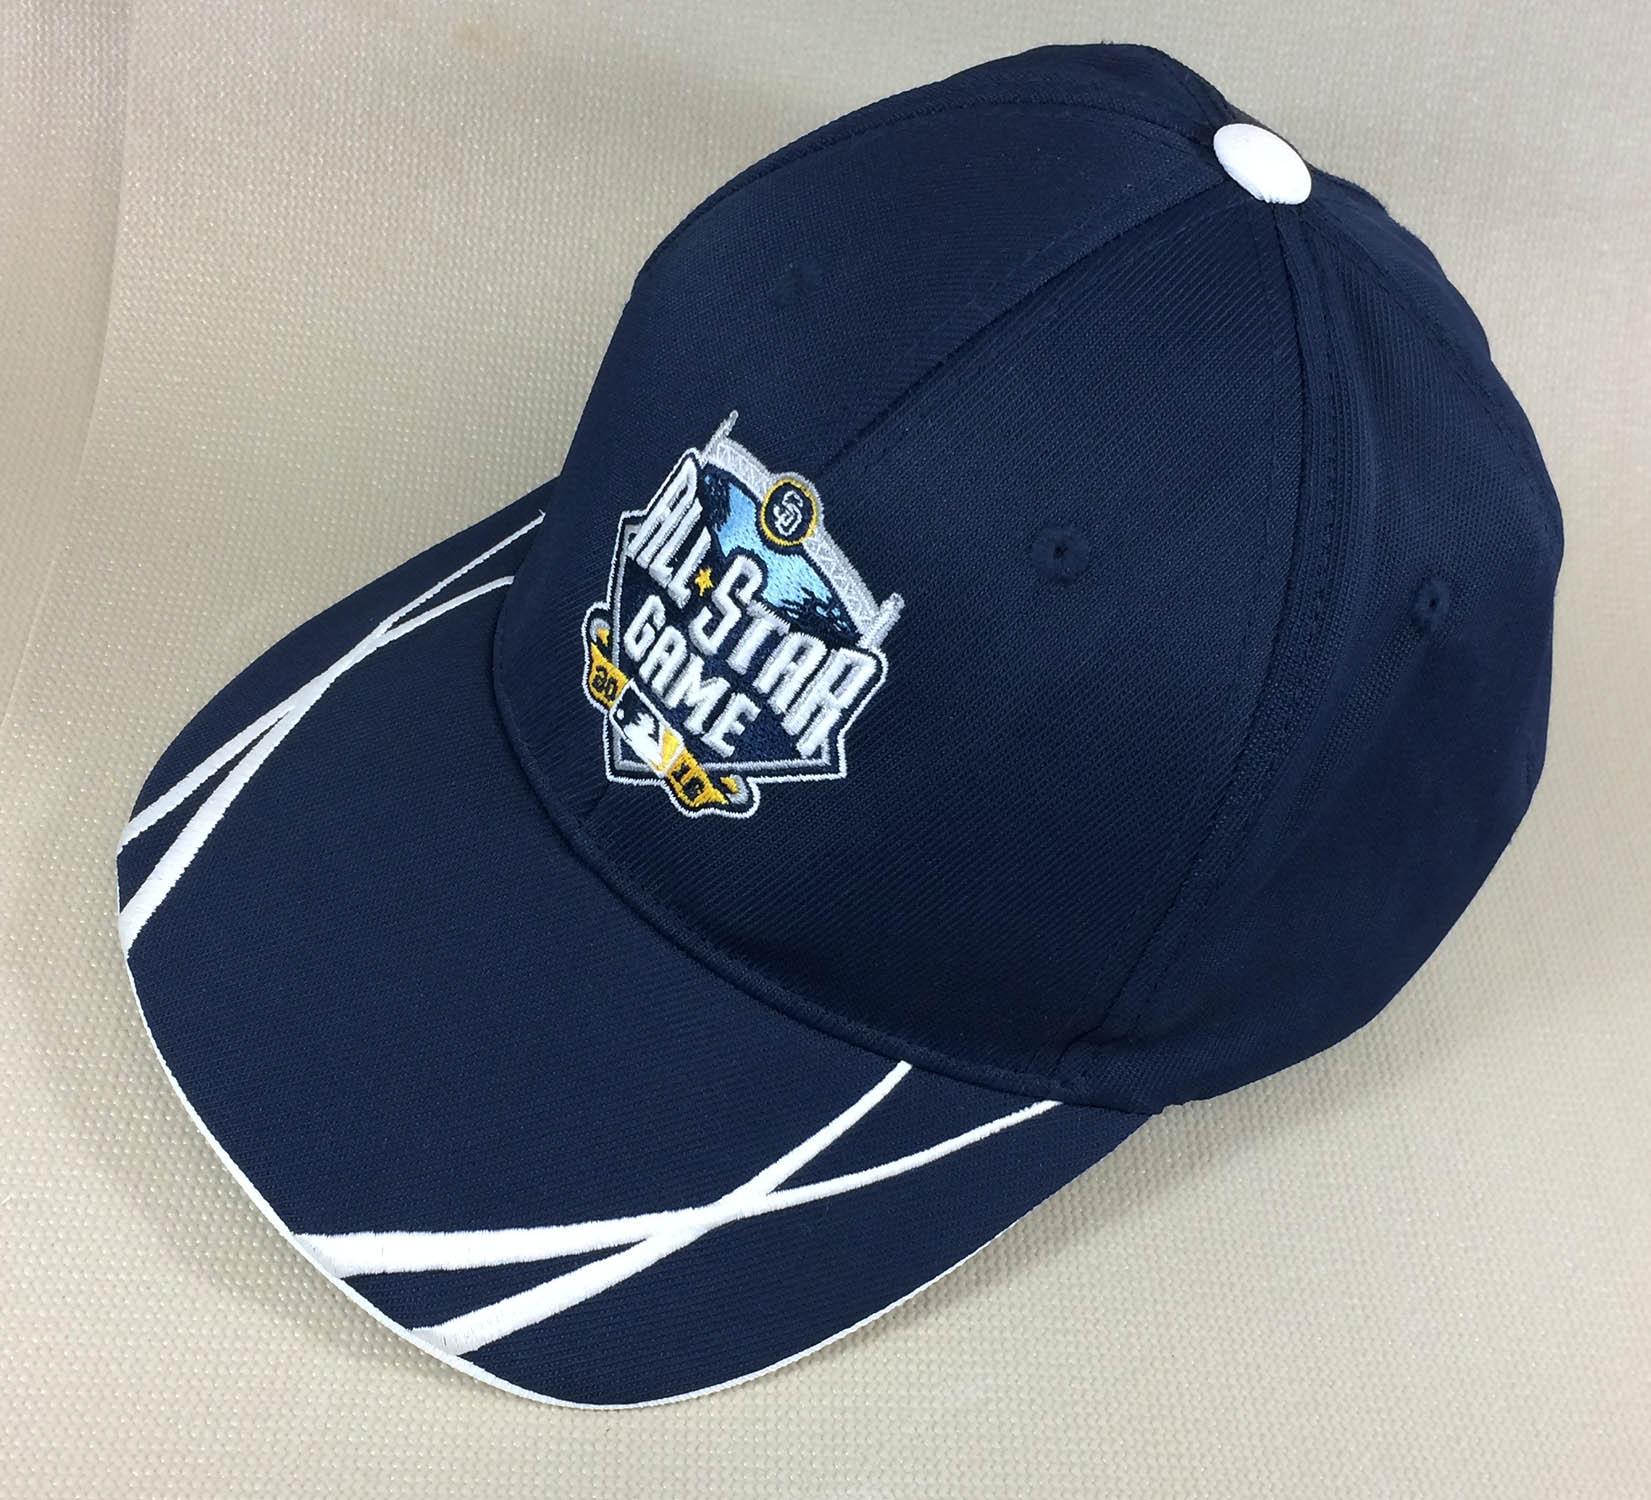 2016 MLB All Star Game fan favorite cap